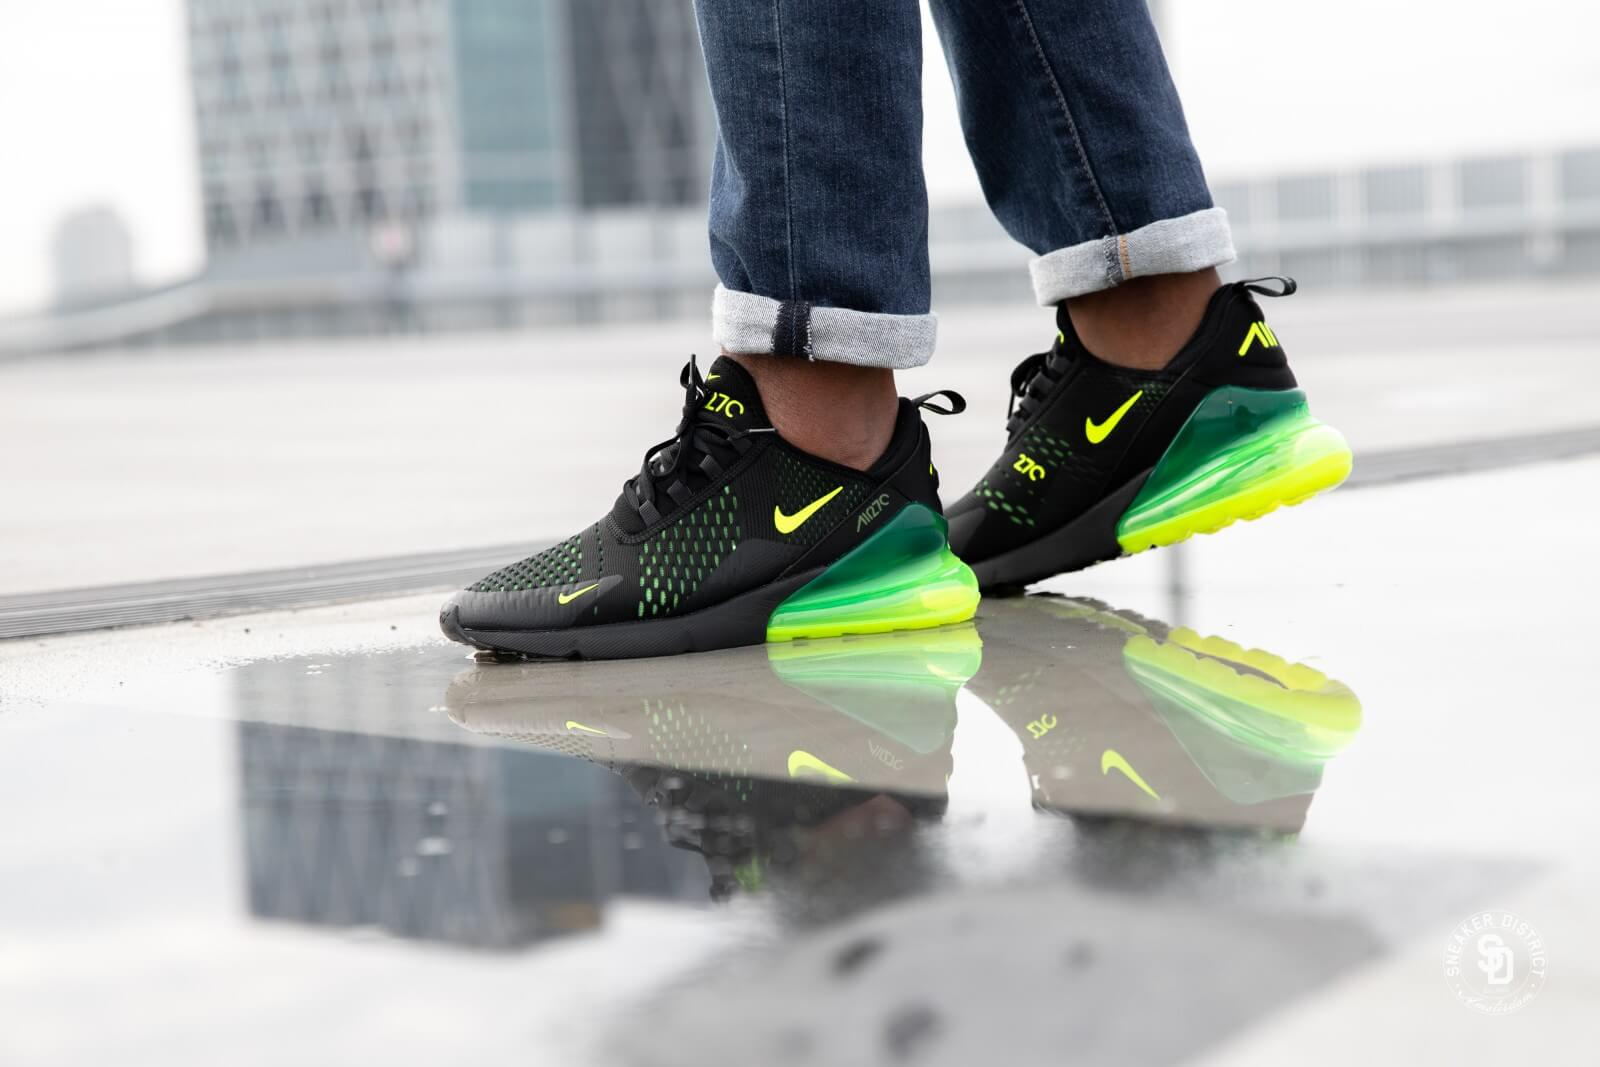 Nike Air Max 270 Black Volt Oil Grey